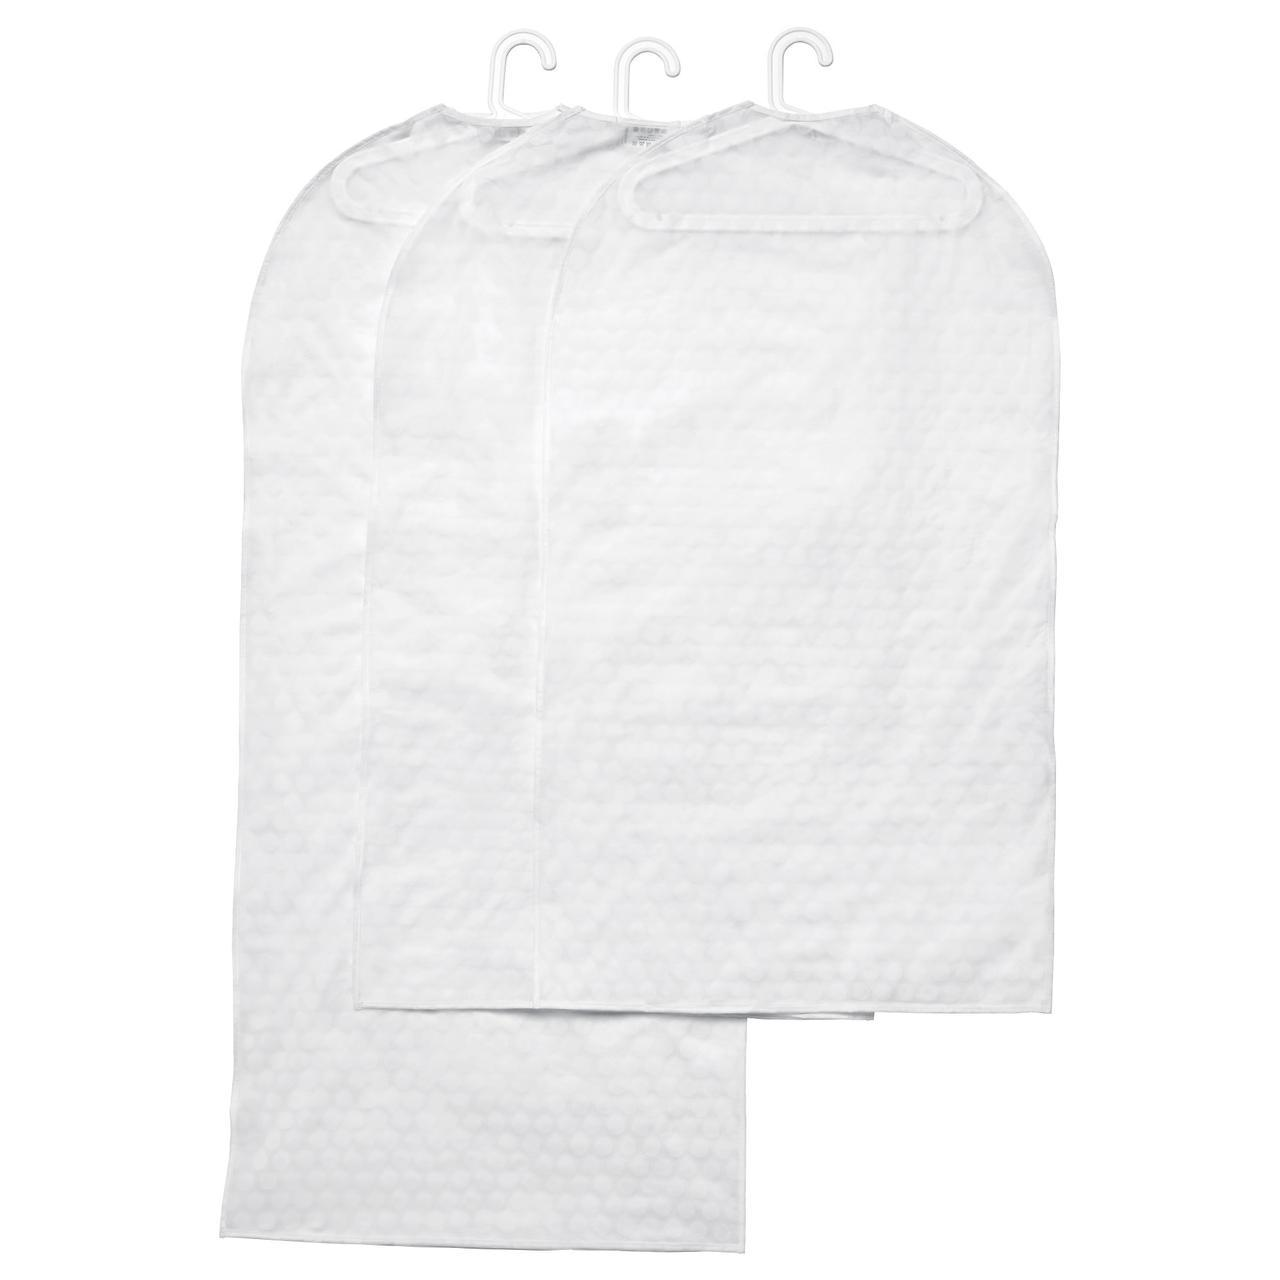 IKEA URING (102.872.52) Чохол для одягу, 3 шт, білий прозорий